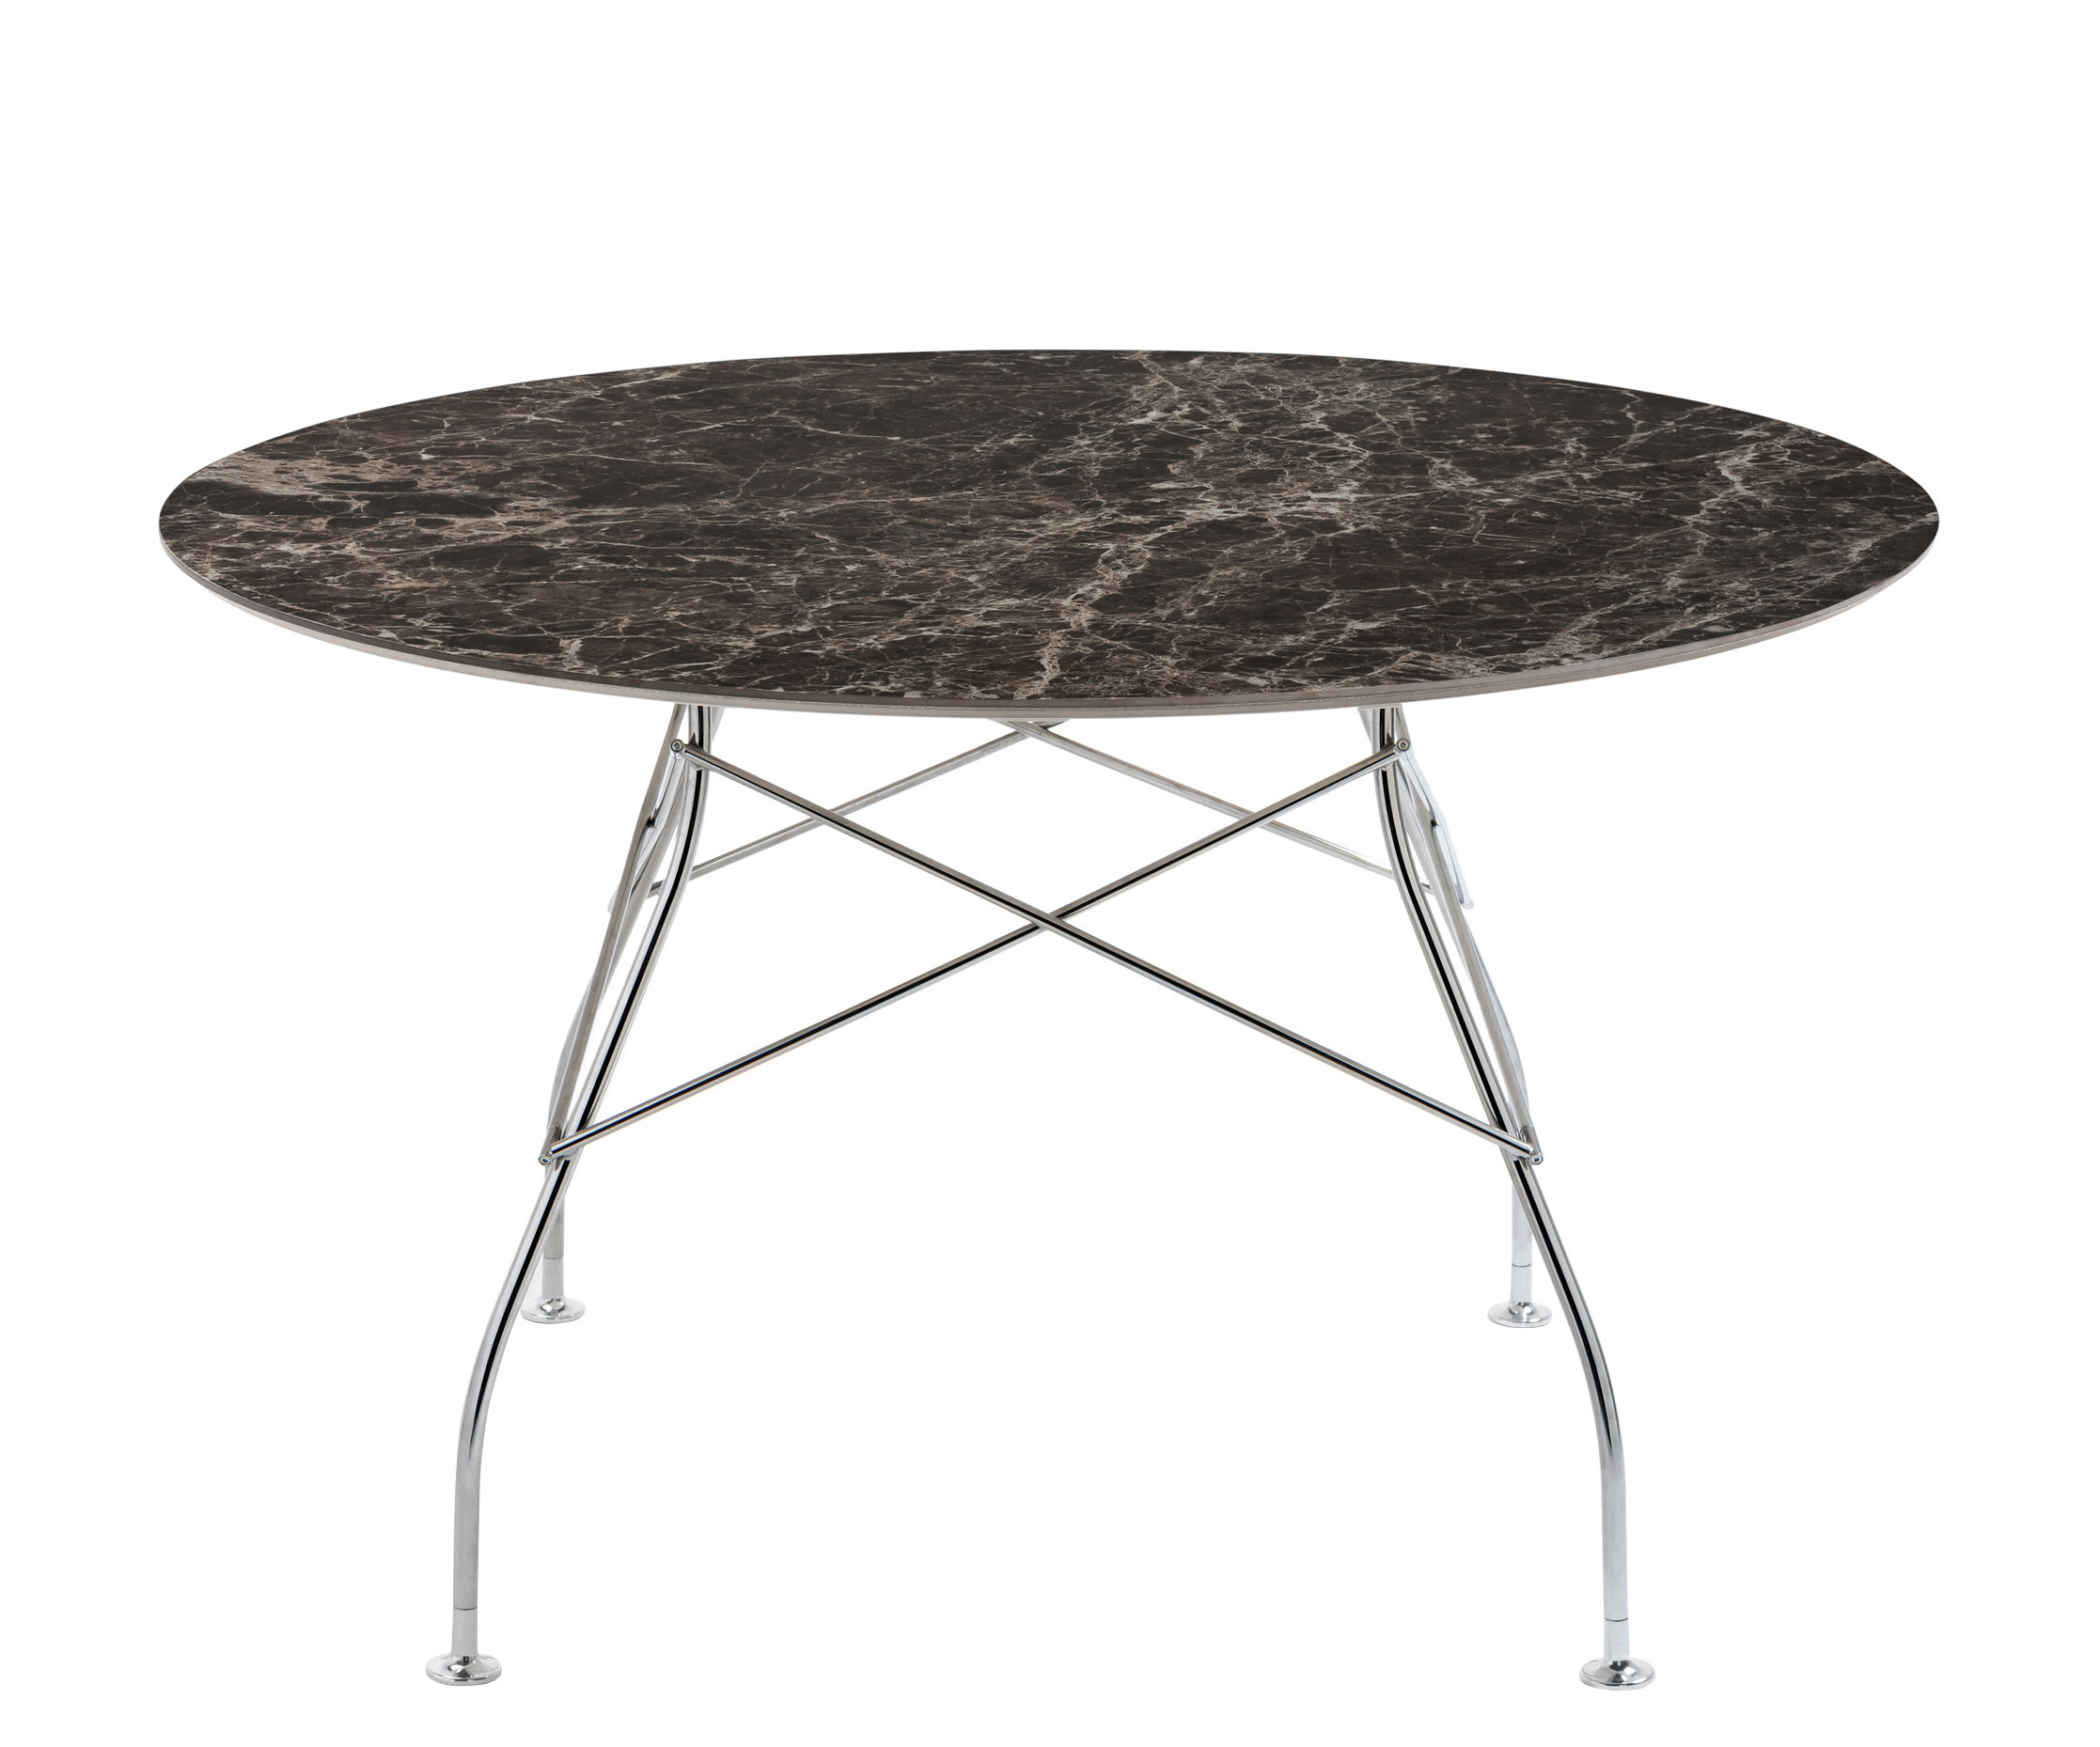 Mobilier - Tables - Table ronde Glossy Marble / Ø 128 cm - Grès effet marbre - Kartell - Marron / Pied chromé - Acier chromé, Grès effet marbre